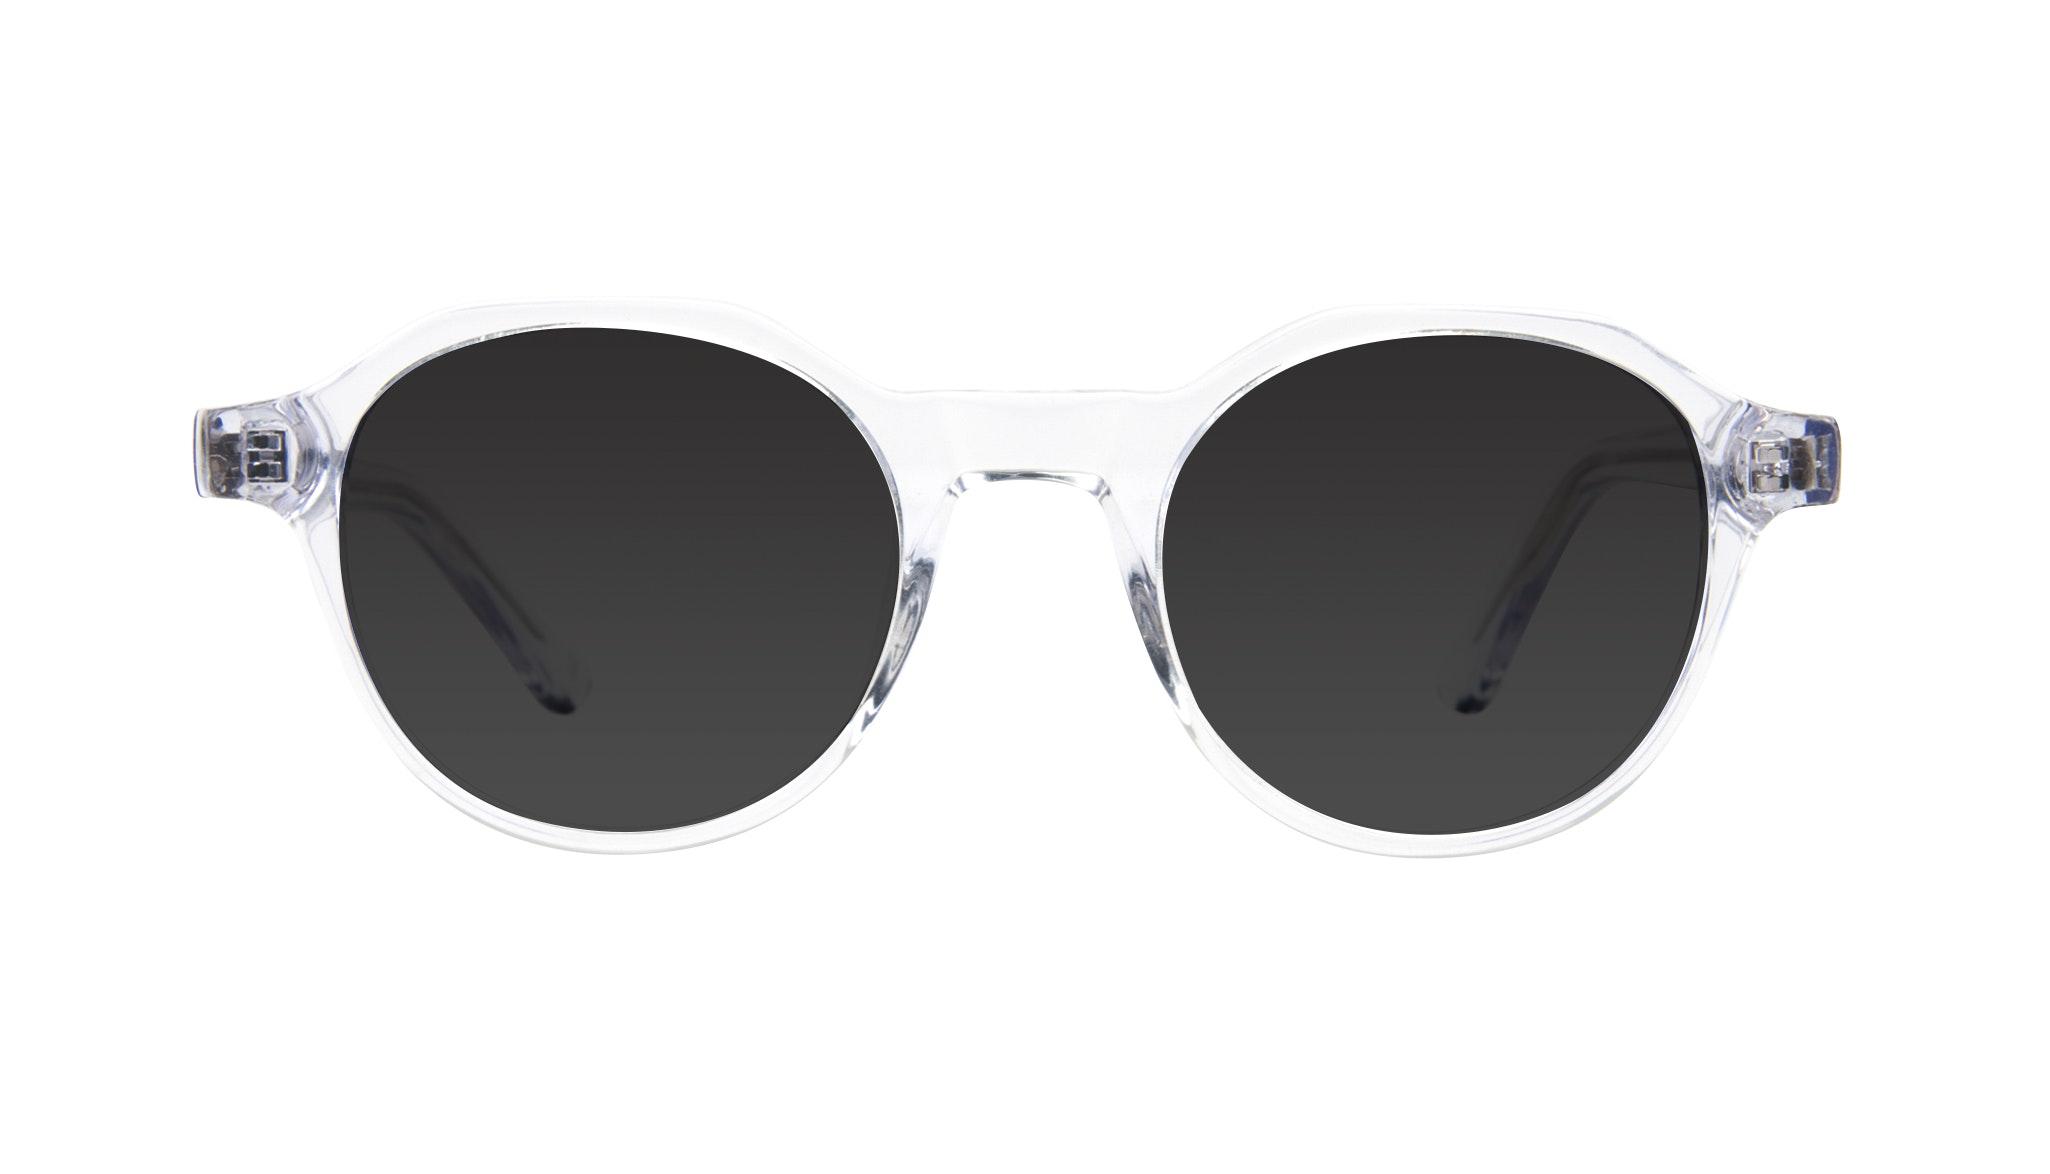 Affordable Fashion Glasses Round Sunglasses Men Form Diamond Front